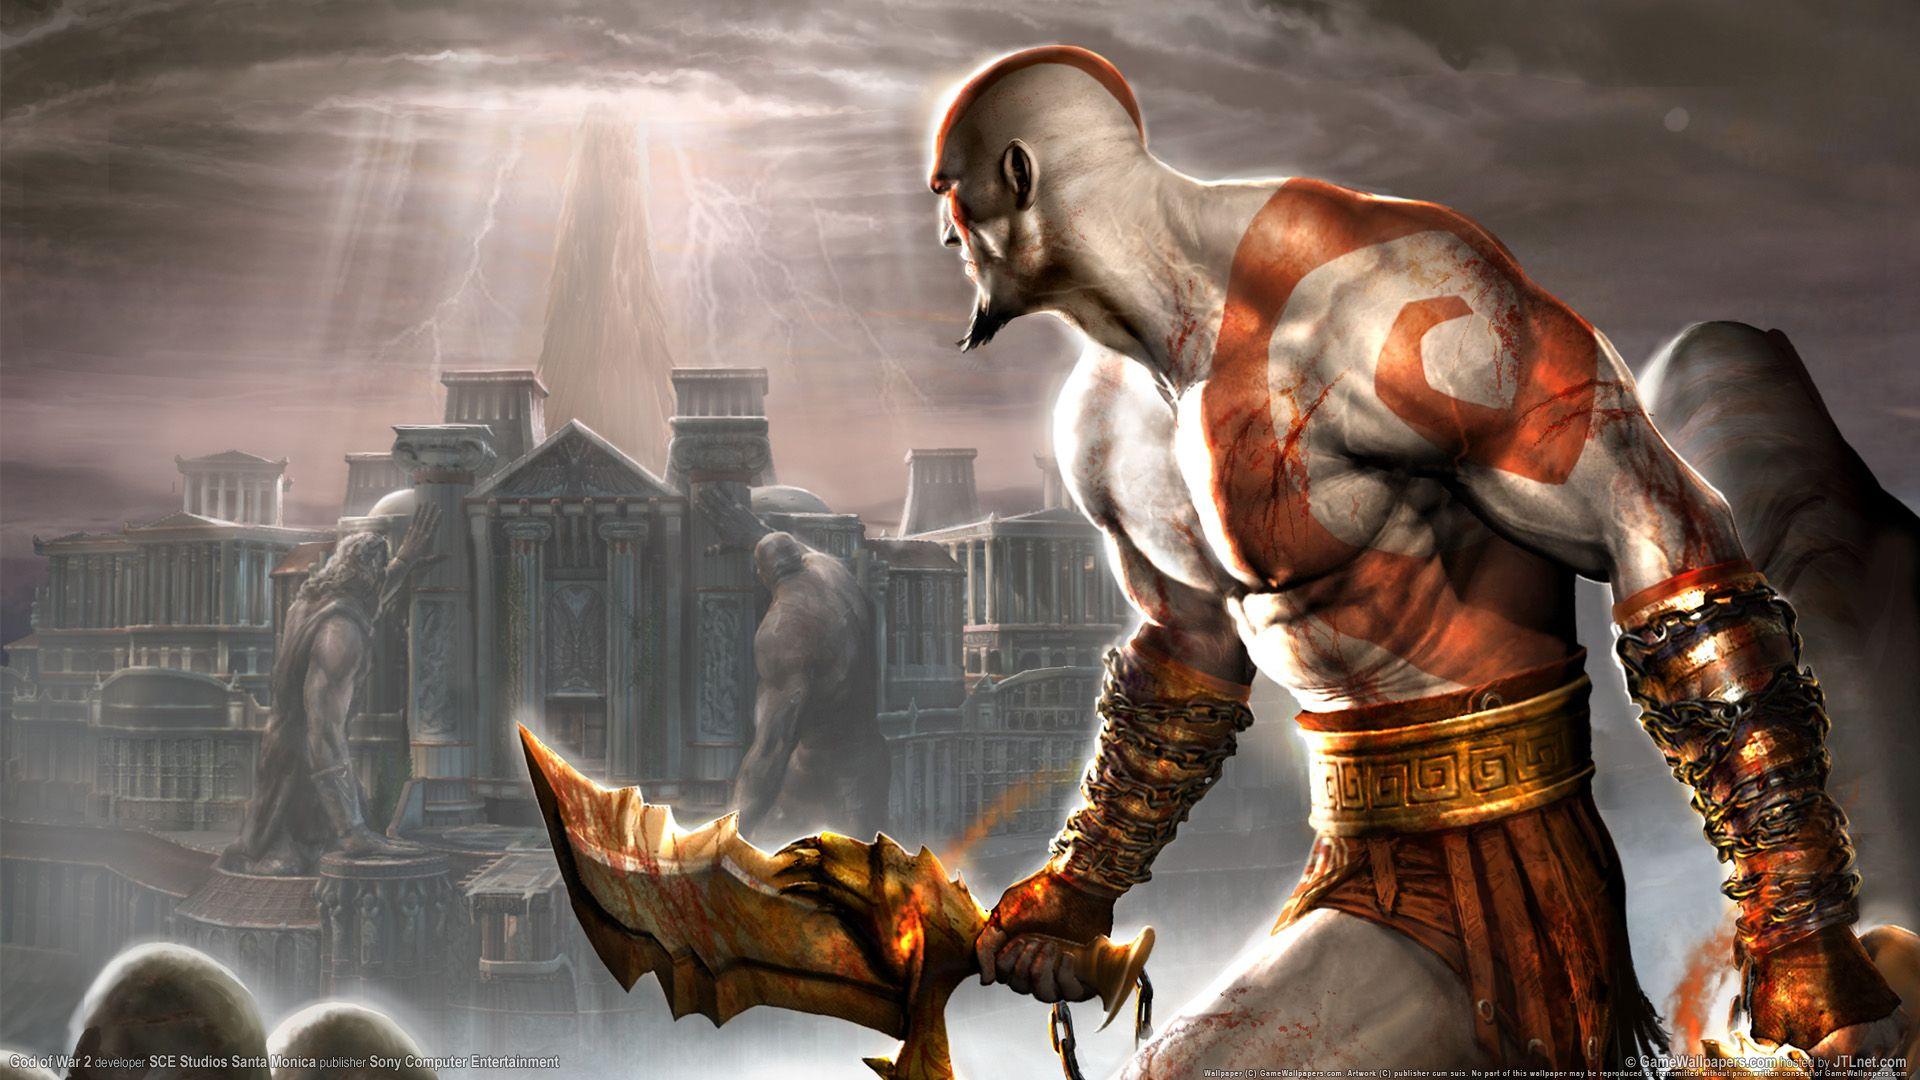 God Of War 2 Ps2 Game Hd Art History Meno Istorija Istoriya